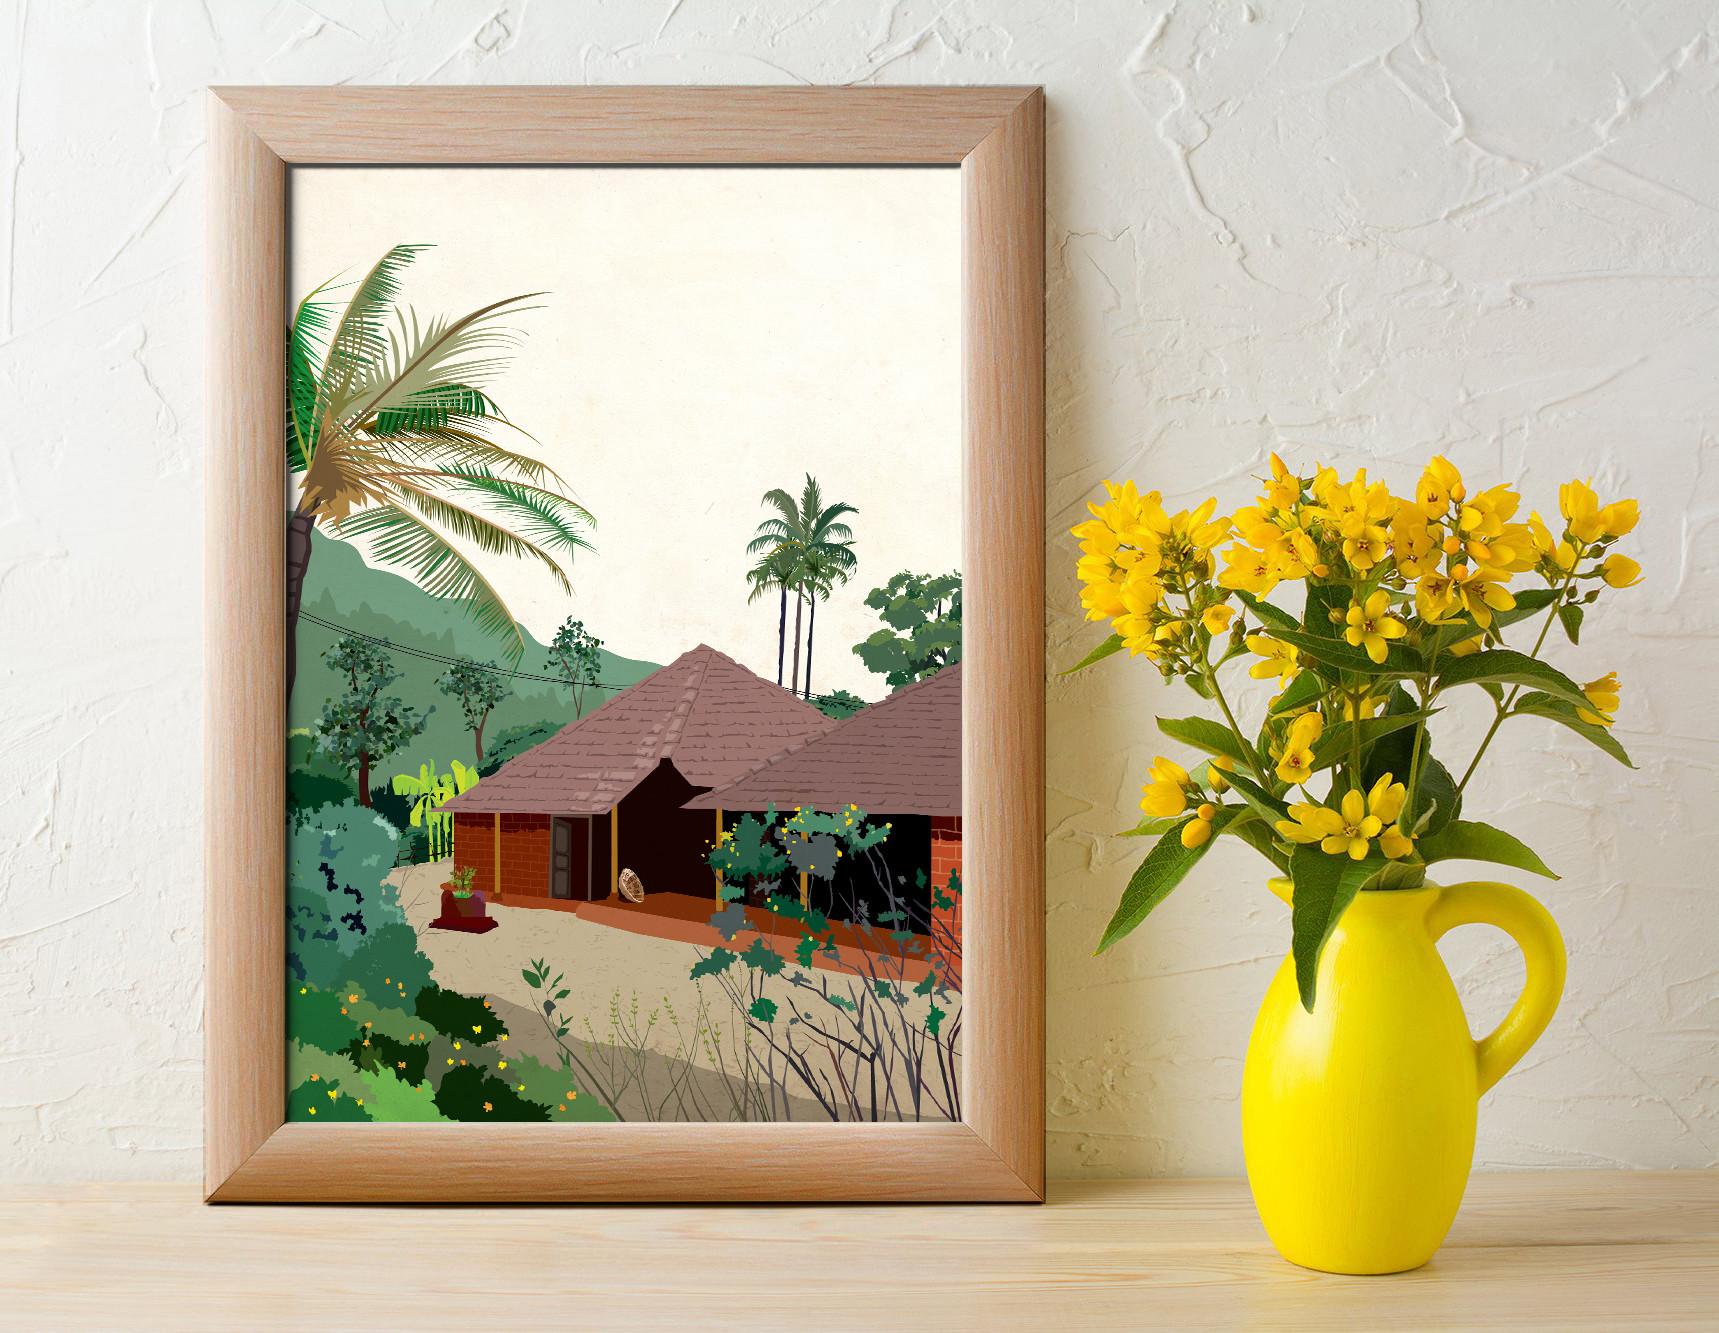 Rajesh r sawant konkan housee yellow pot